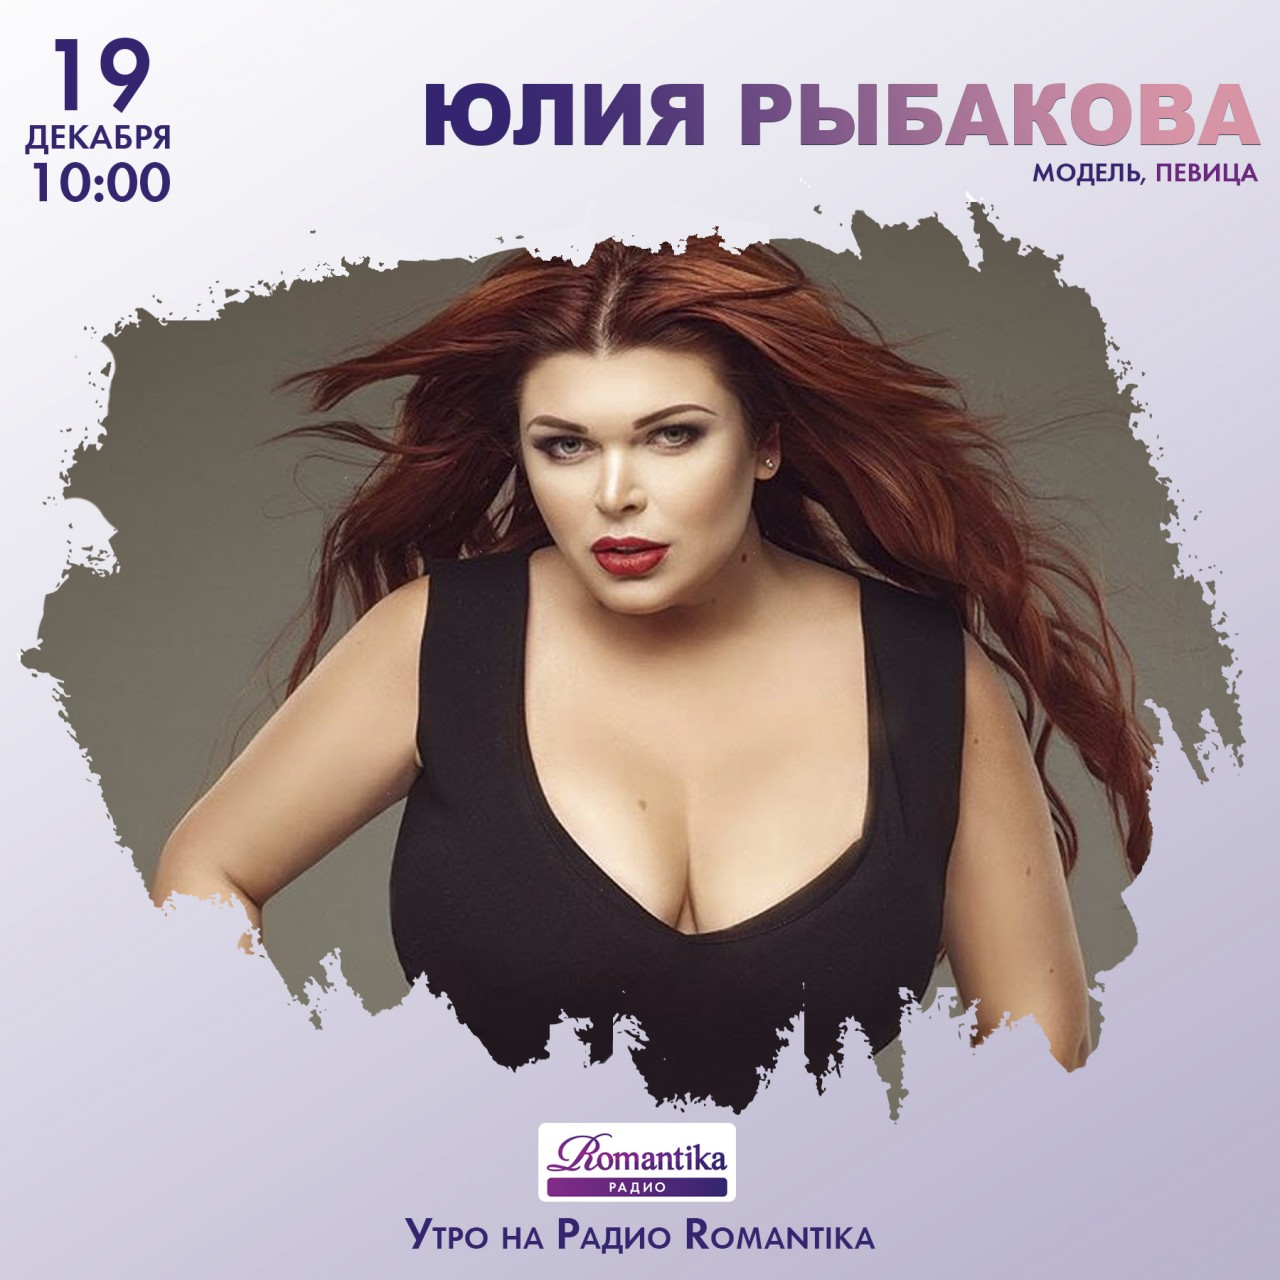 Радио Romantika: 19 декабря …